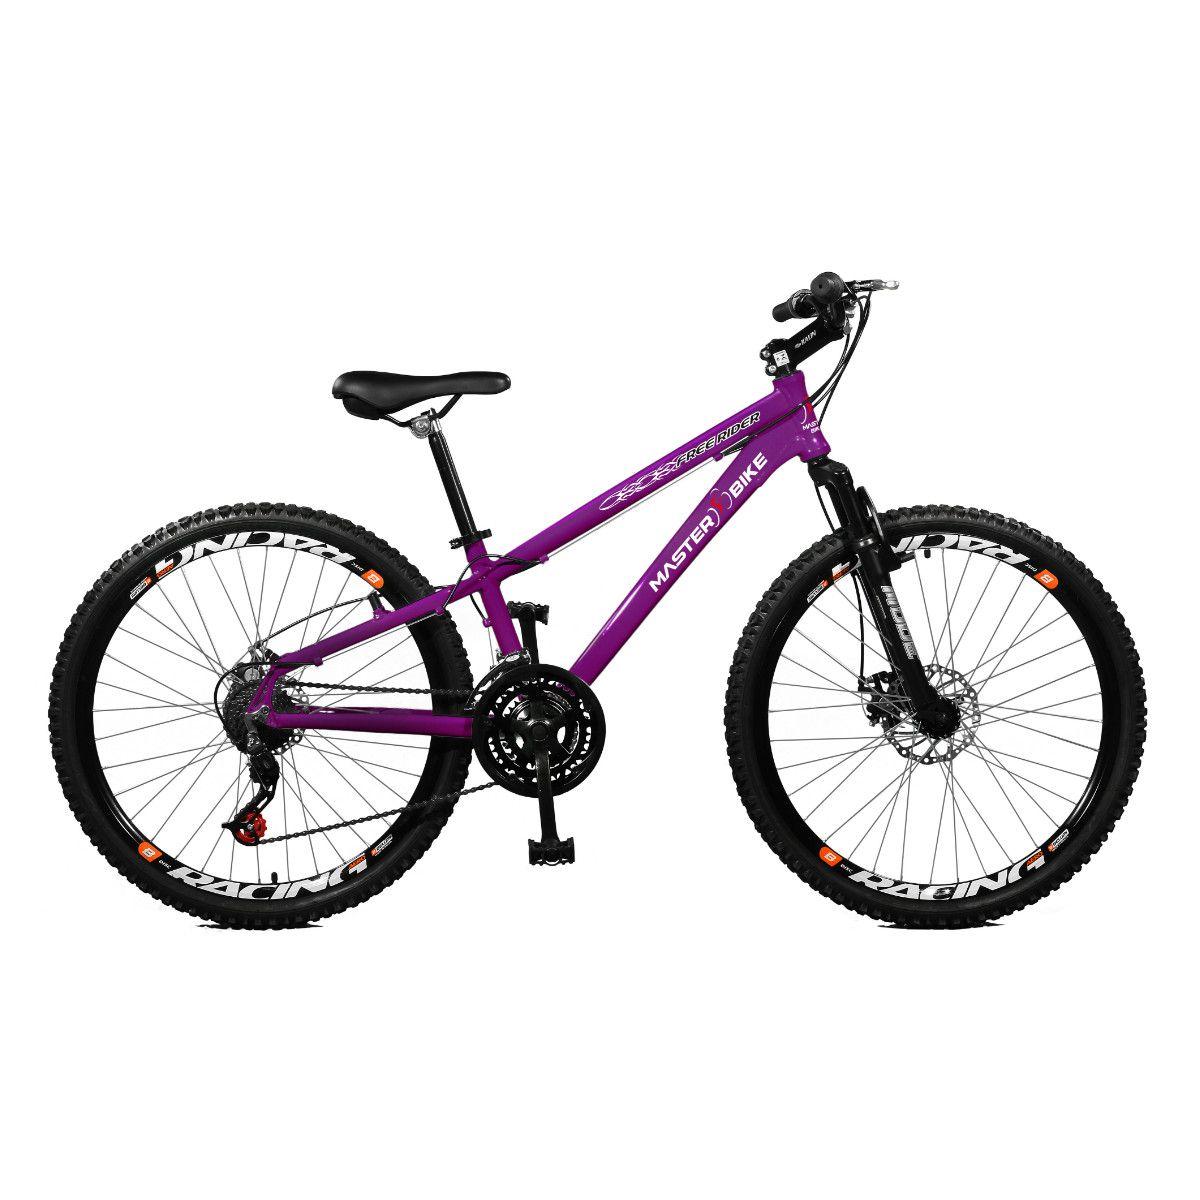 Bicicleta Master Bike Aro 26 Free Rider Freio à Disco A-36 21 V  Roxo Neon